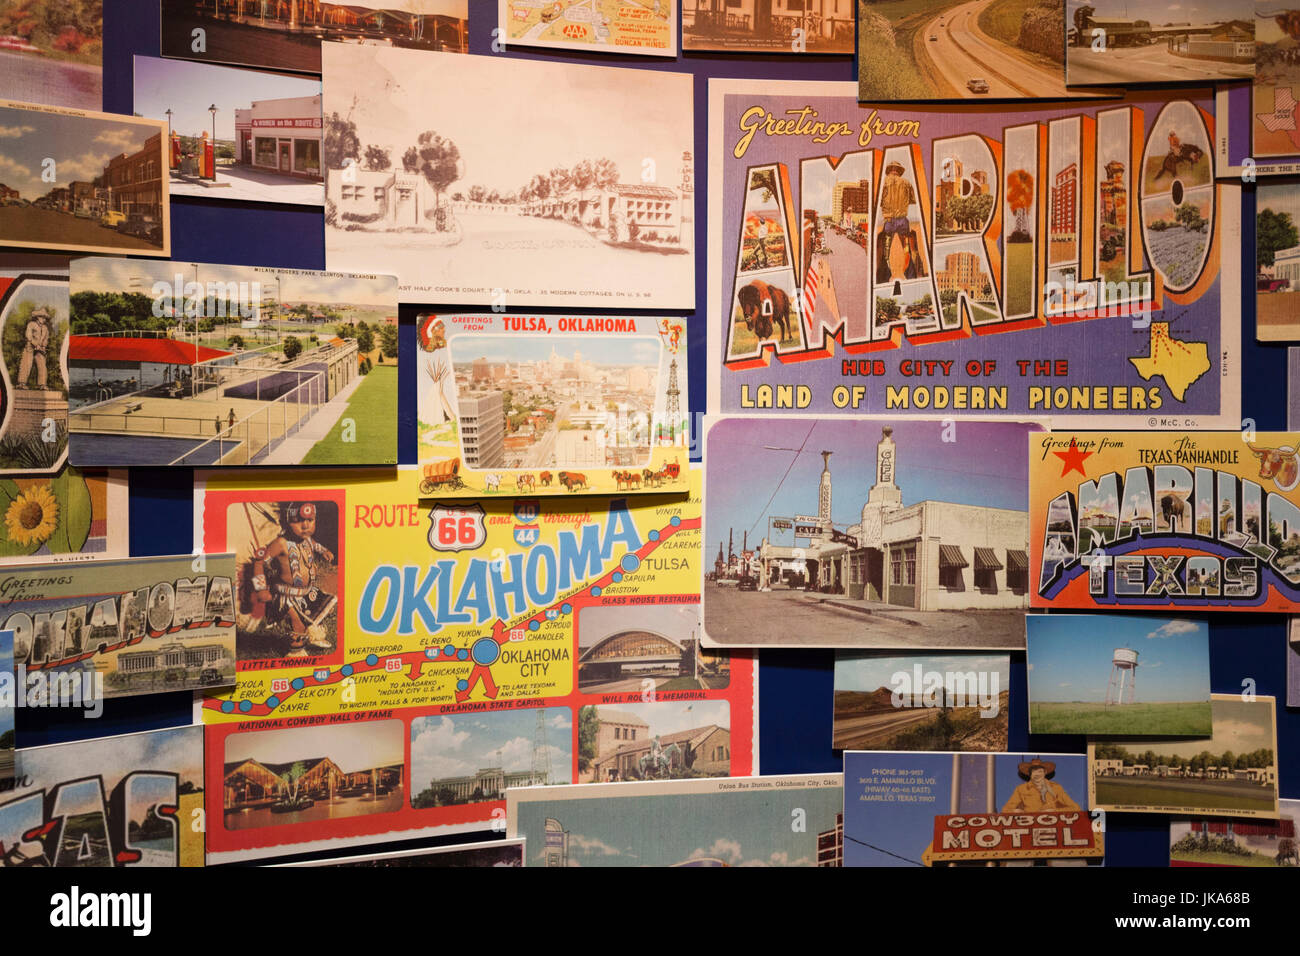 USA, Oklahoma, Clinton, Route 66 Museum, postcards - Stock Image